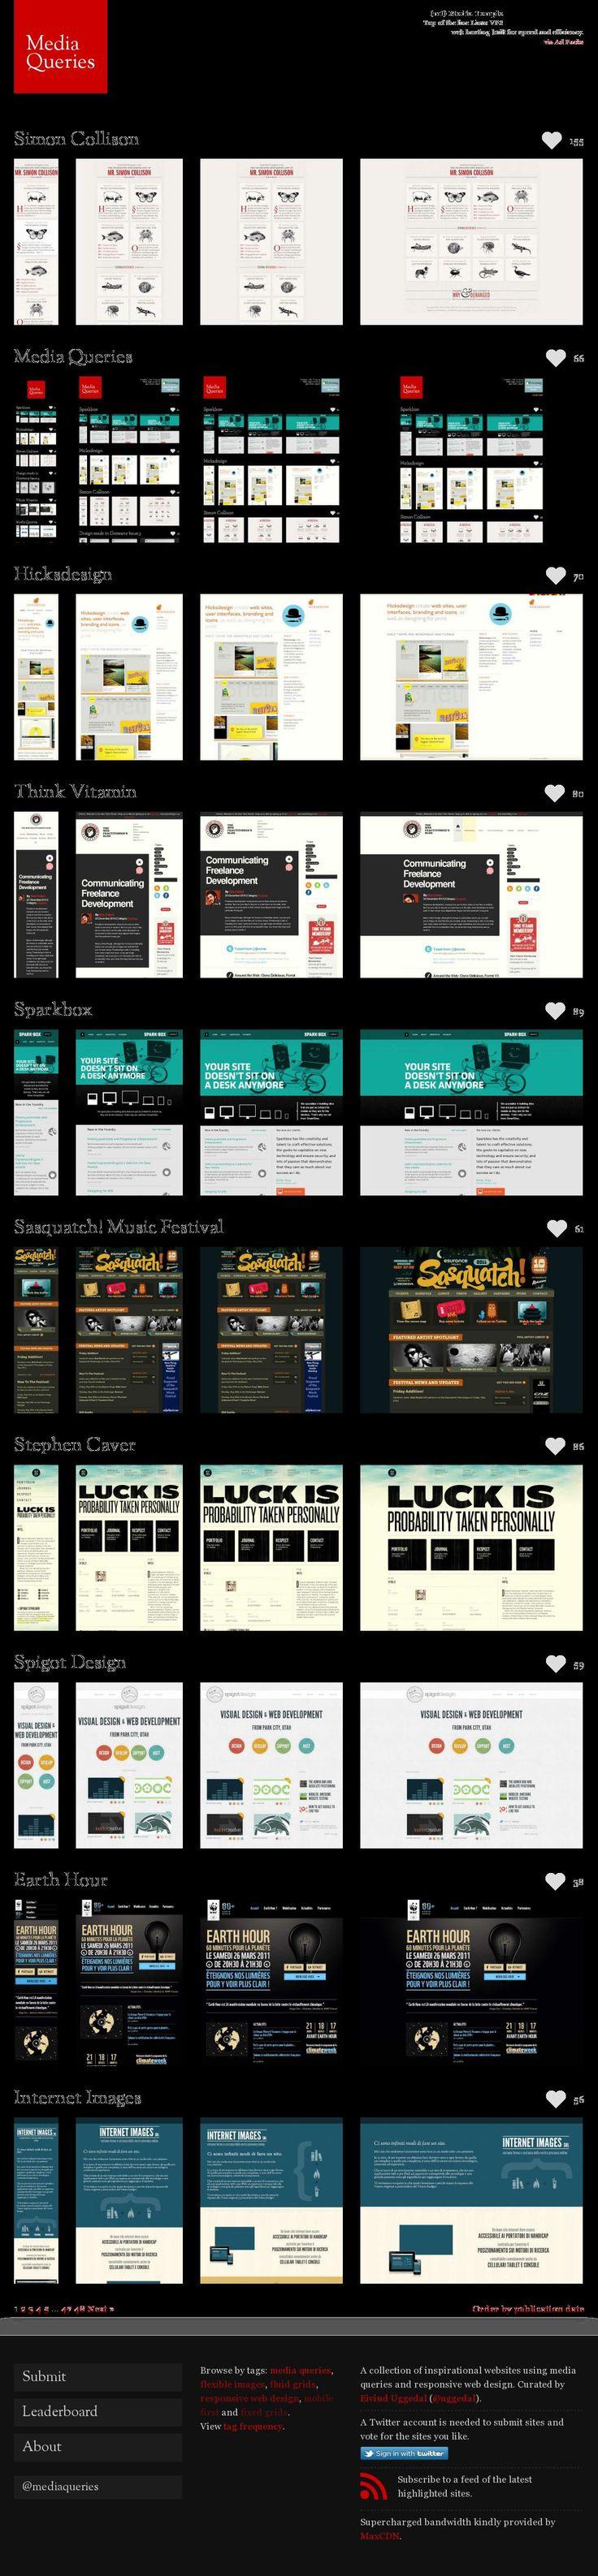 Excellent examples of responsive design via http://mediaqueri.es/popular #ux #ui #responsive #design